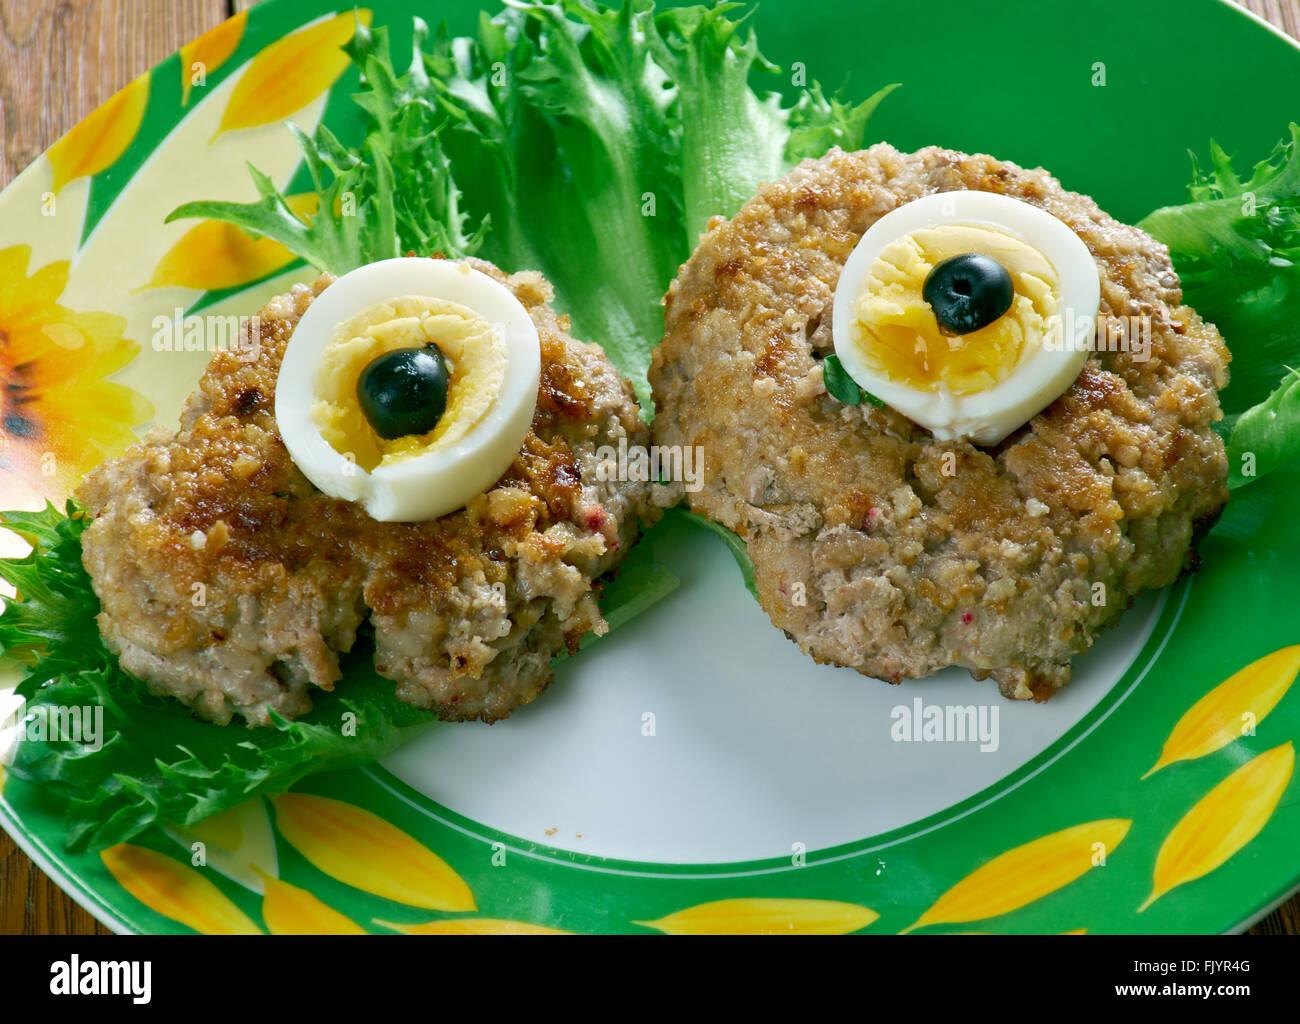 Spooky Eyeballs - Halloween party appetizer - Stock Image